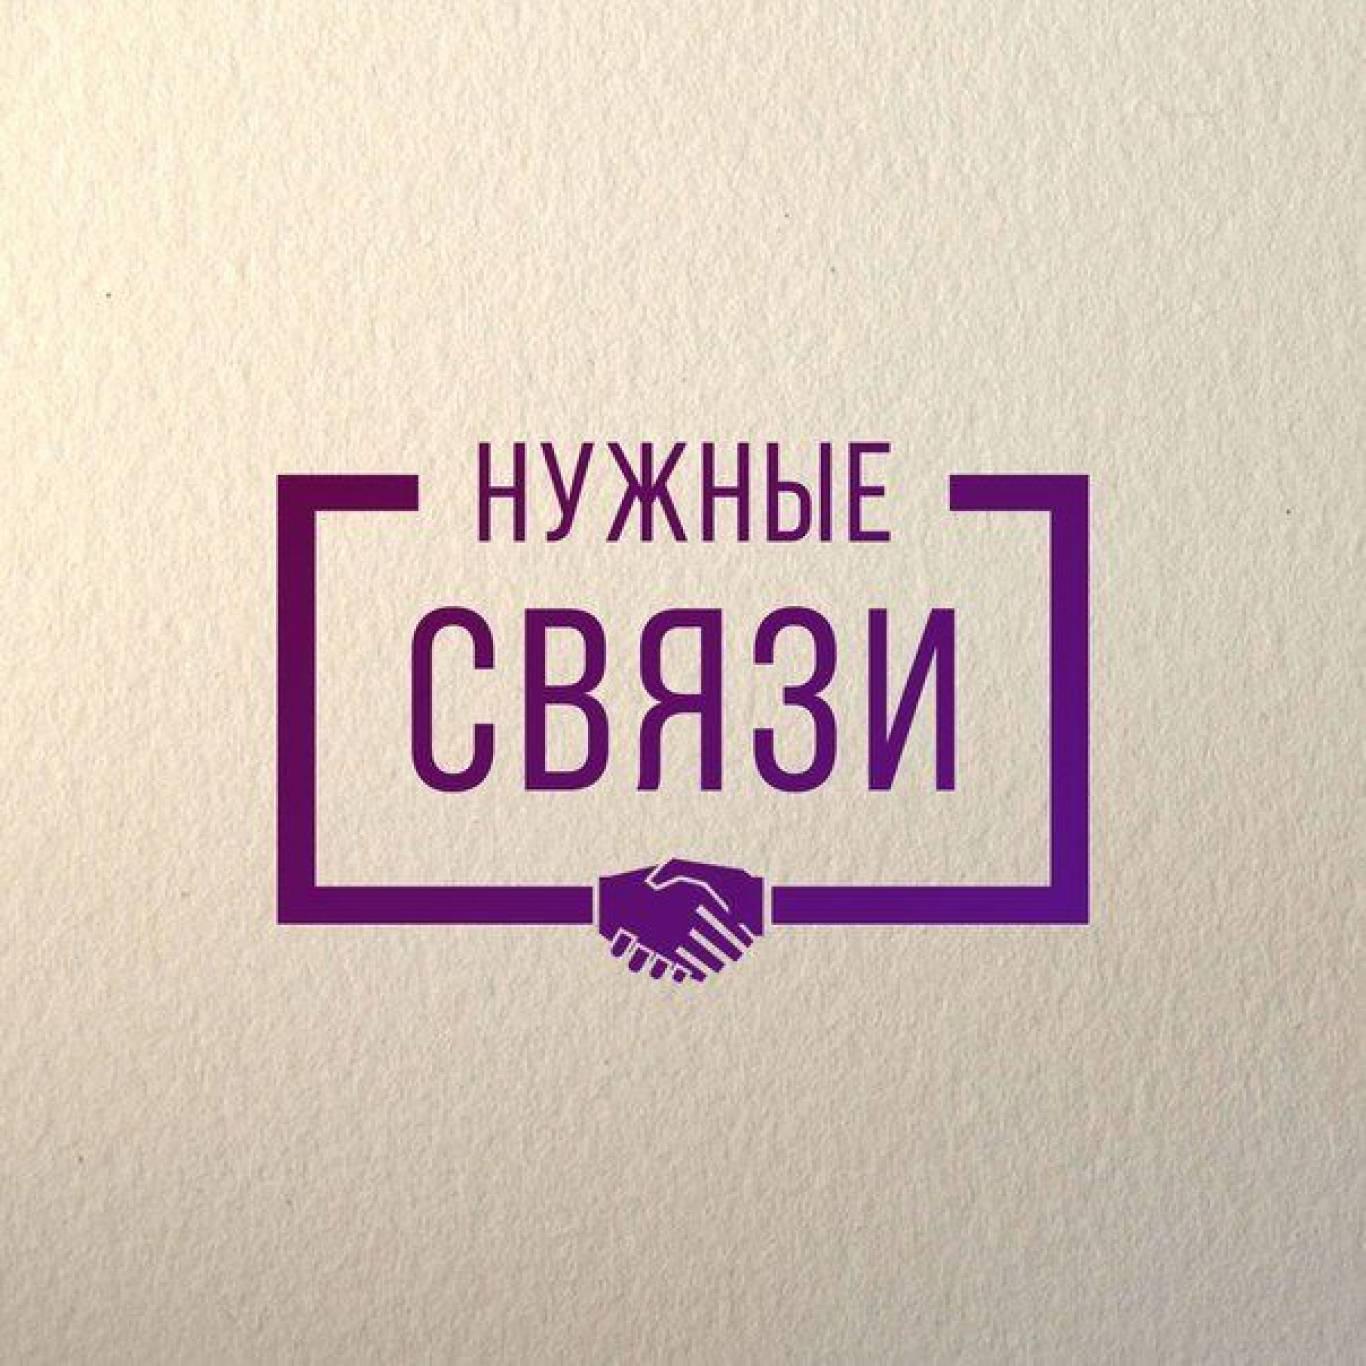 "Зустріч клубу ""Нужные связи"""